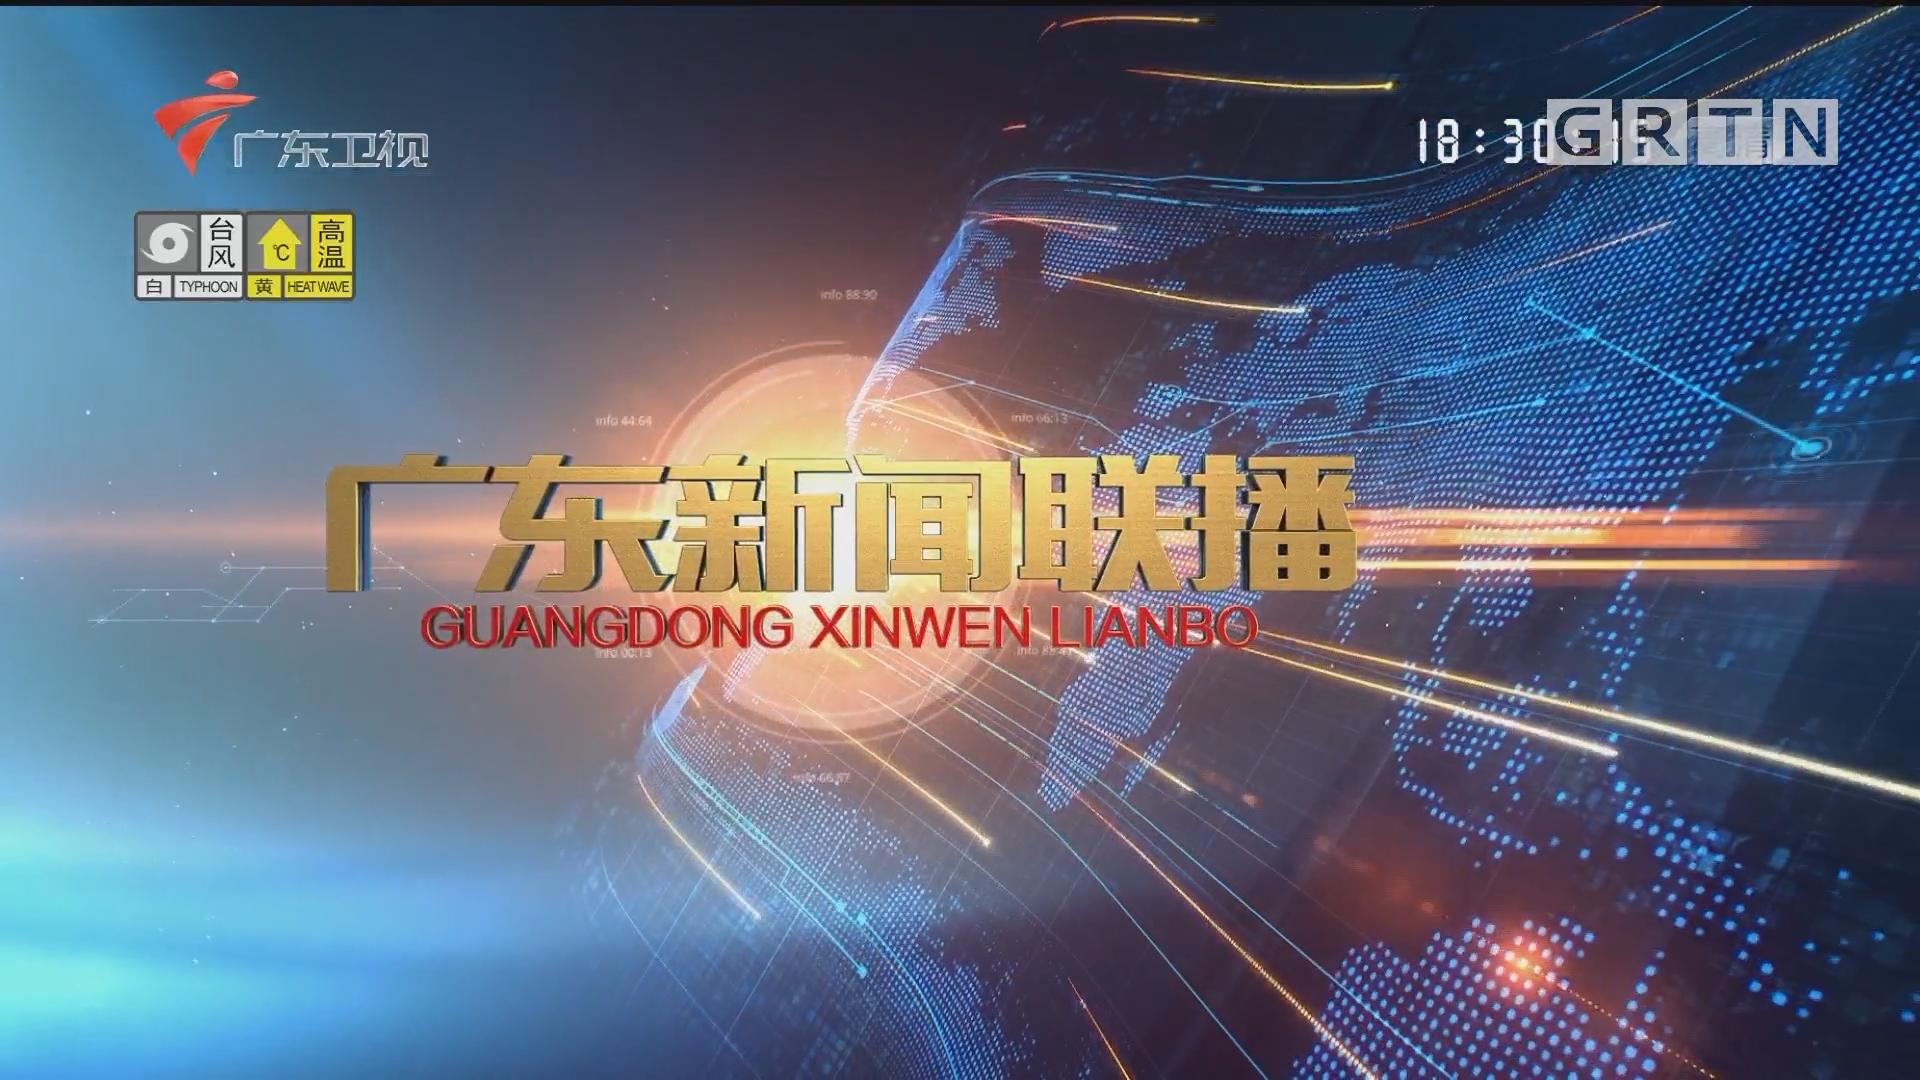 [HD][2017-09-03]广东新闻联播:习近平出席金砖国家工商论坛开幕式并发表主旨演讲